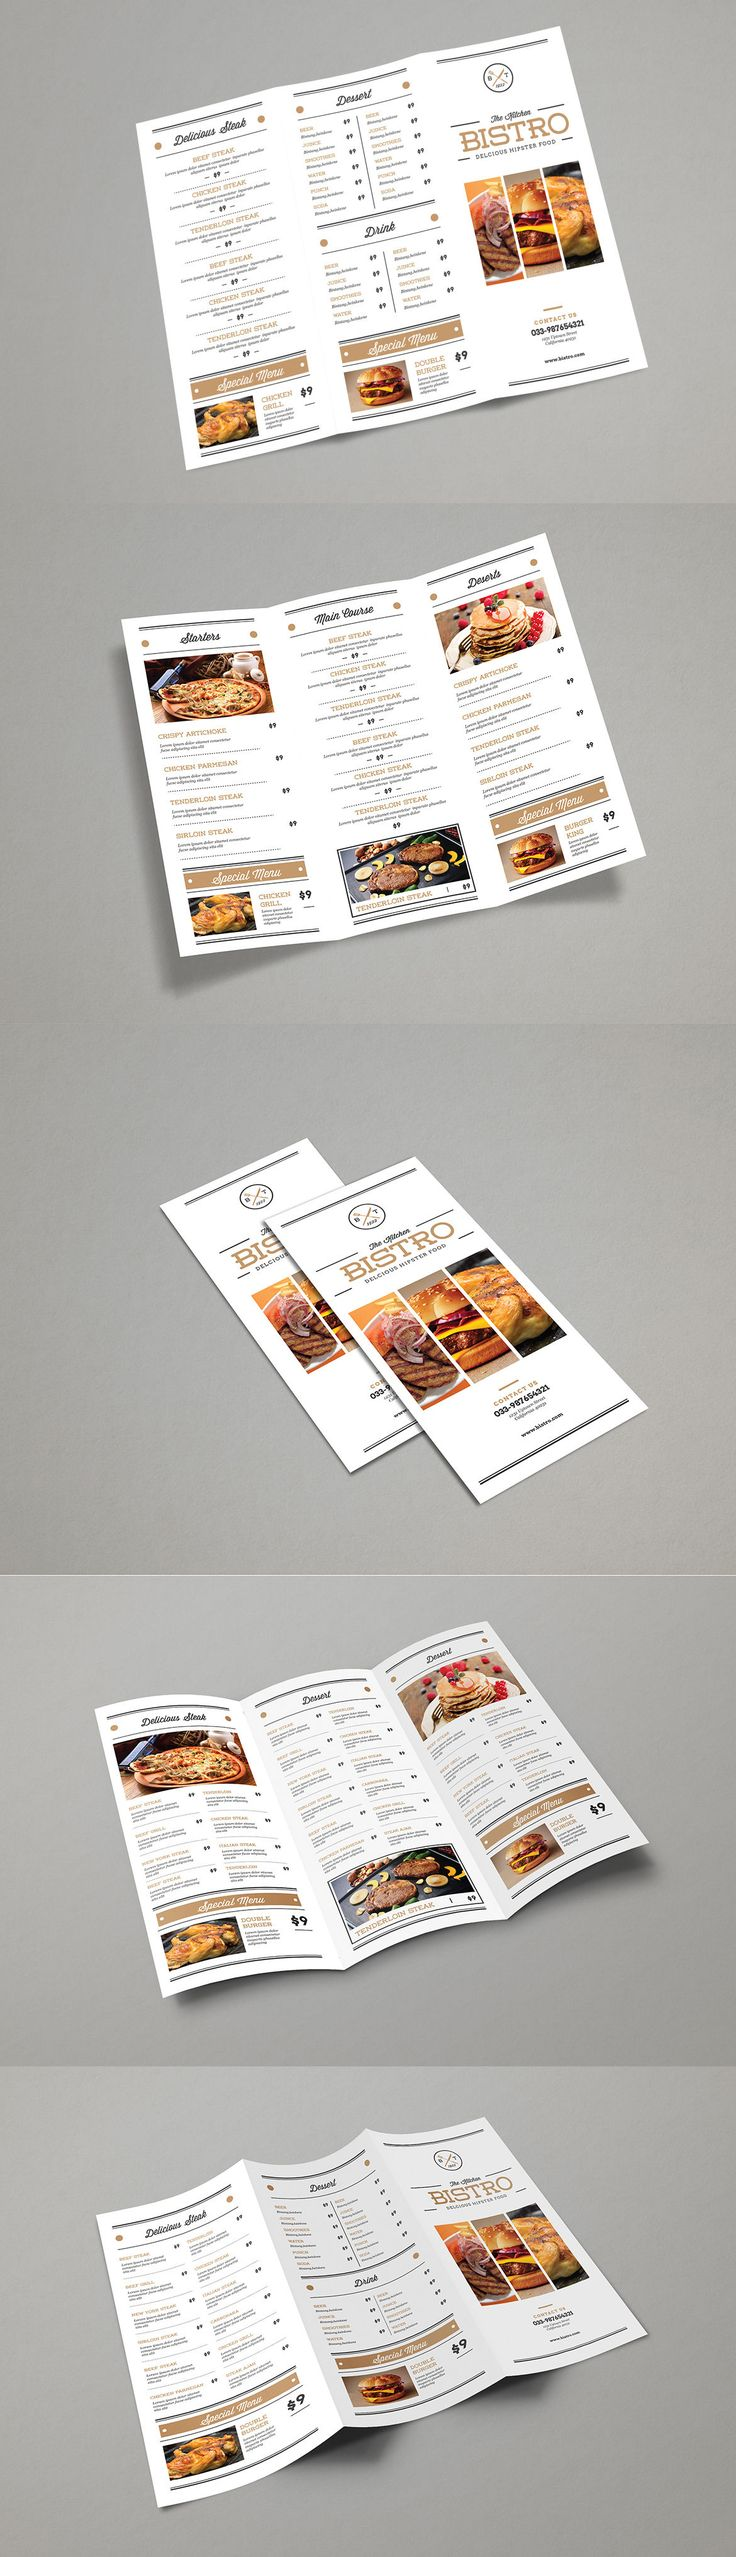 Trifold Minimalis Menu Brochure Template Vector AI, PSD